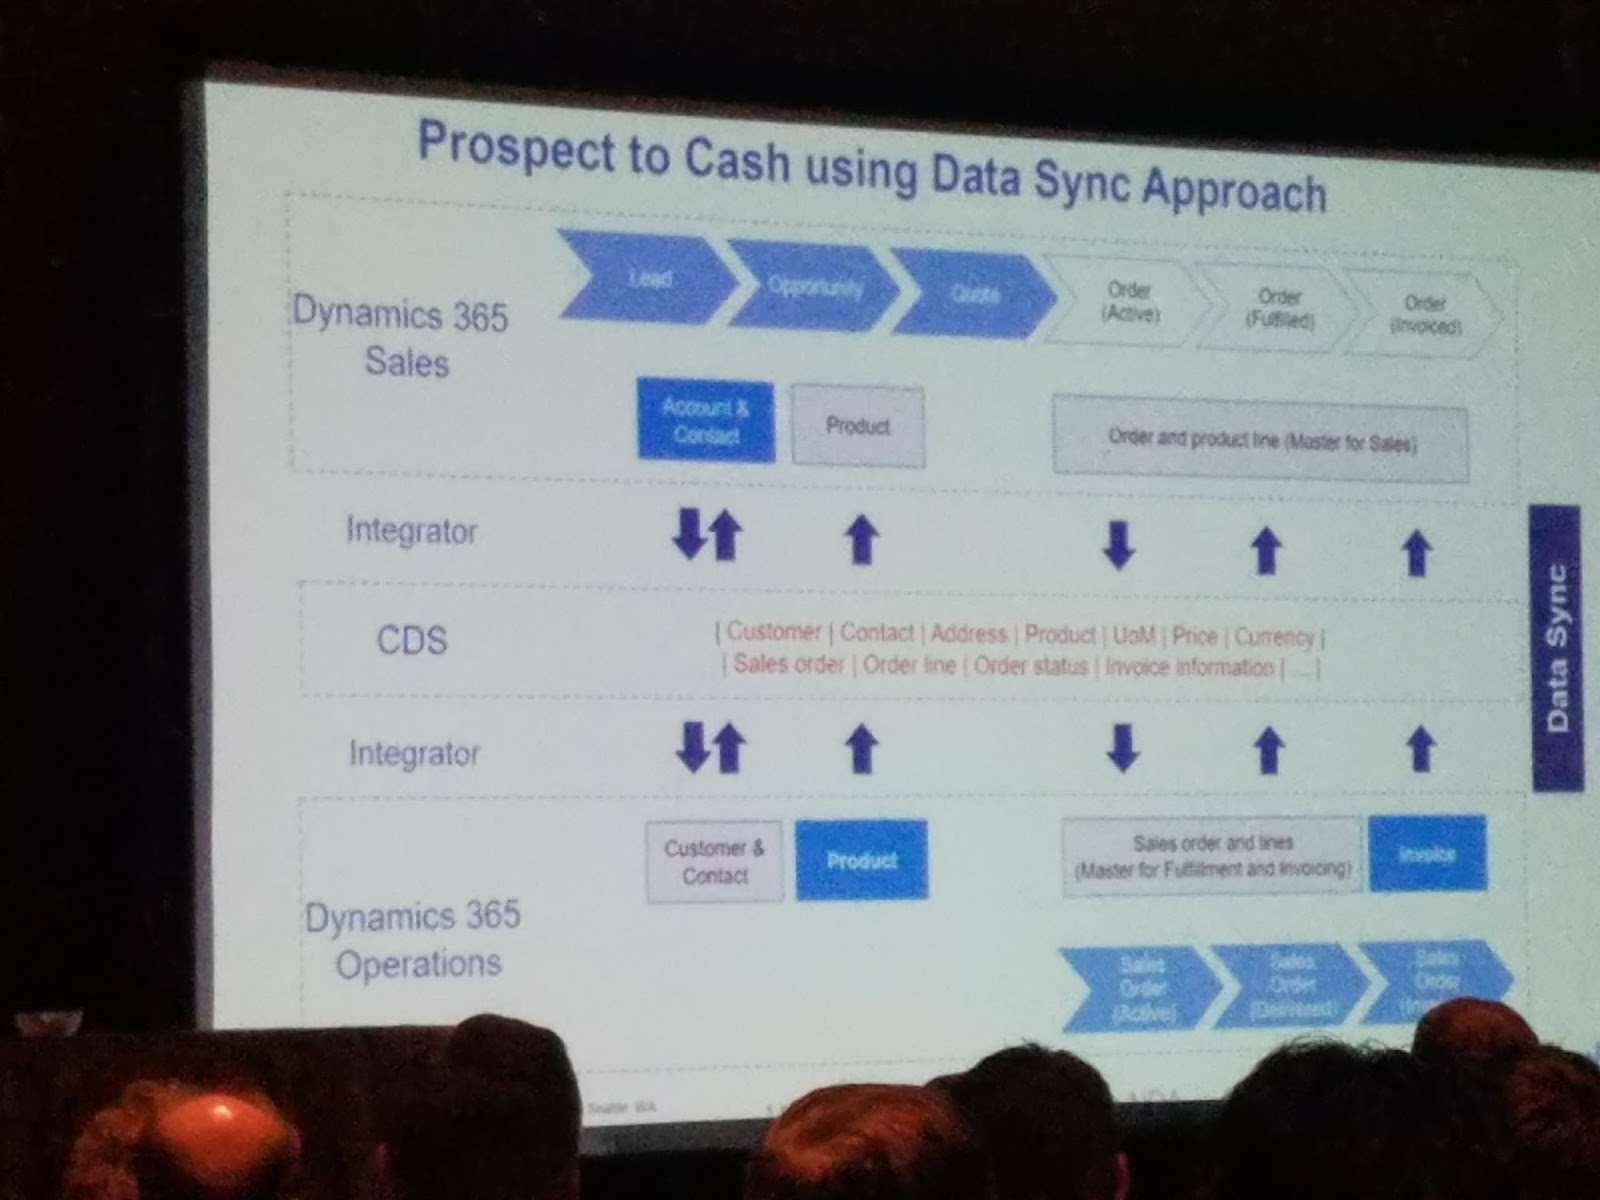 Alex on DAX (Alex Kwitny): New features (CDS Integrations